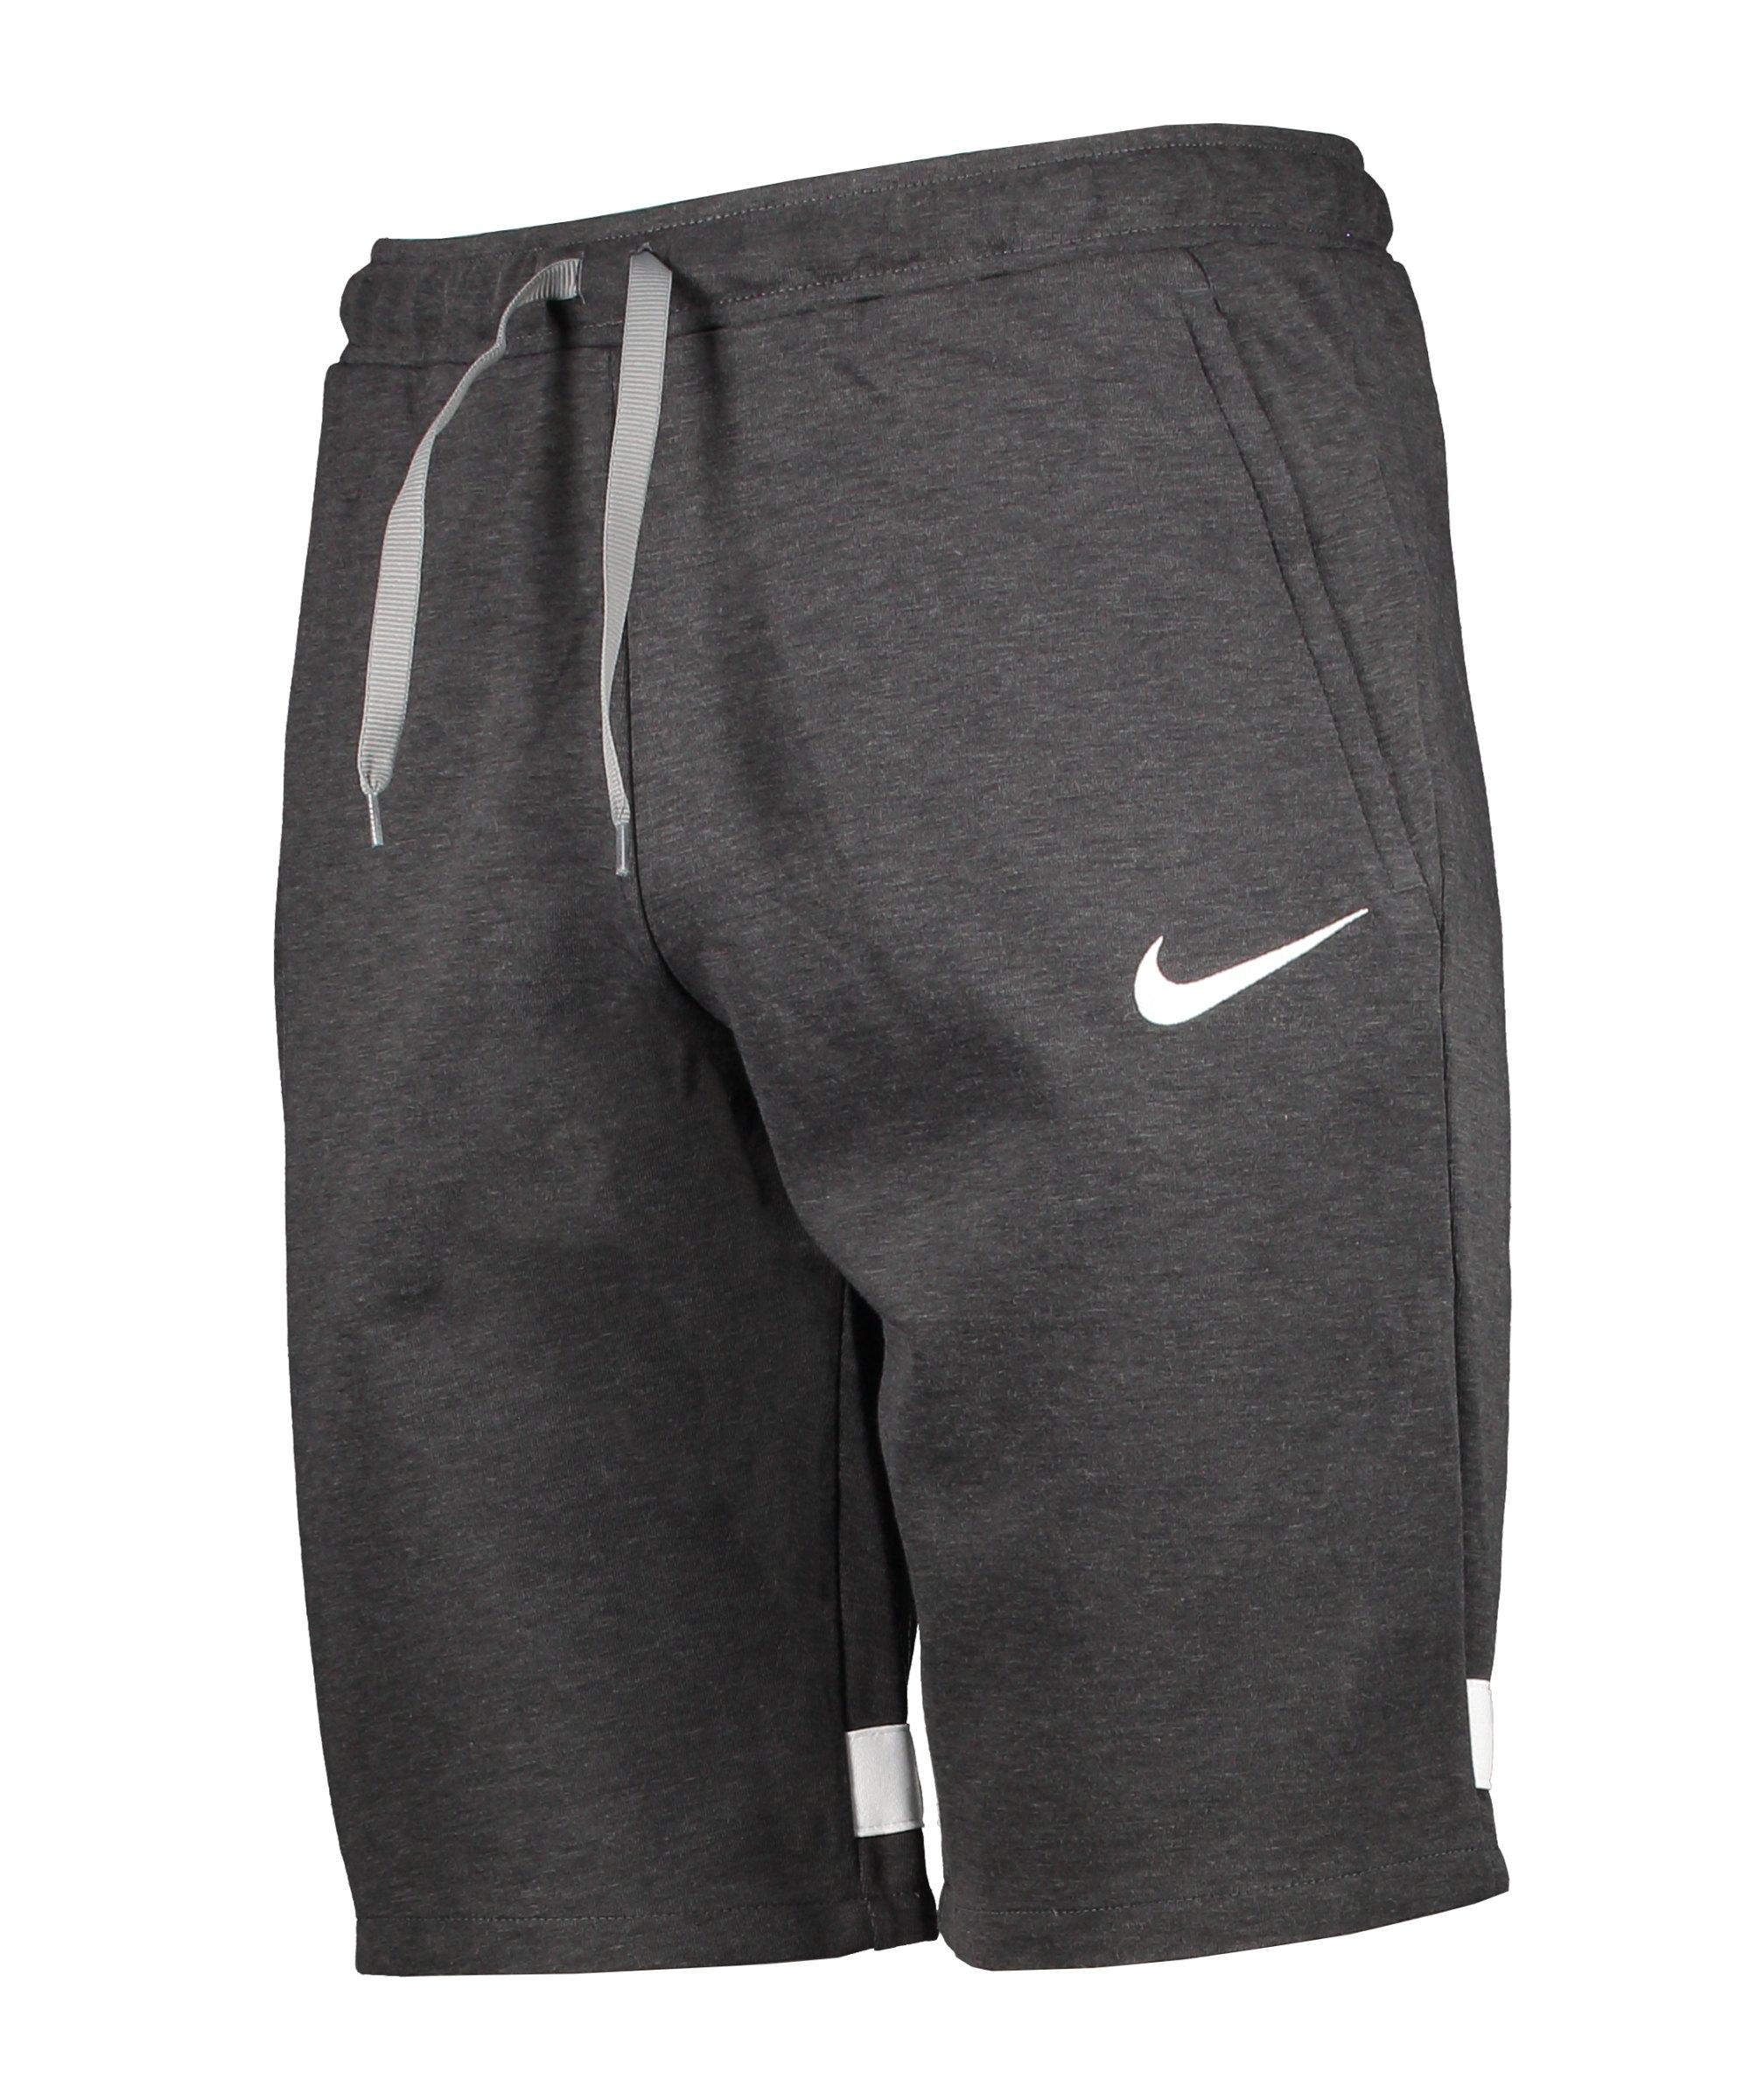 Nike Strike 21 Fleece Short Grau Weiss F011 - grau